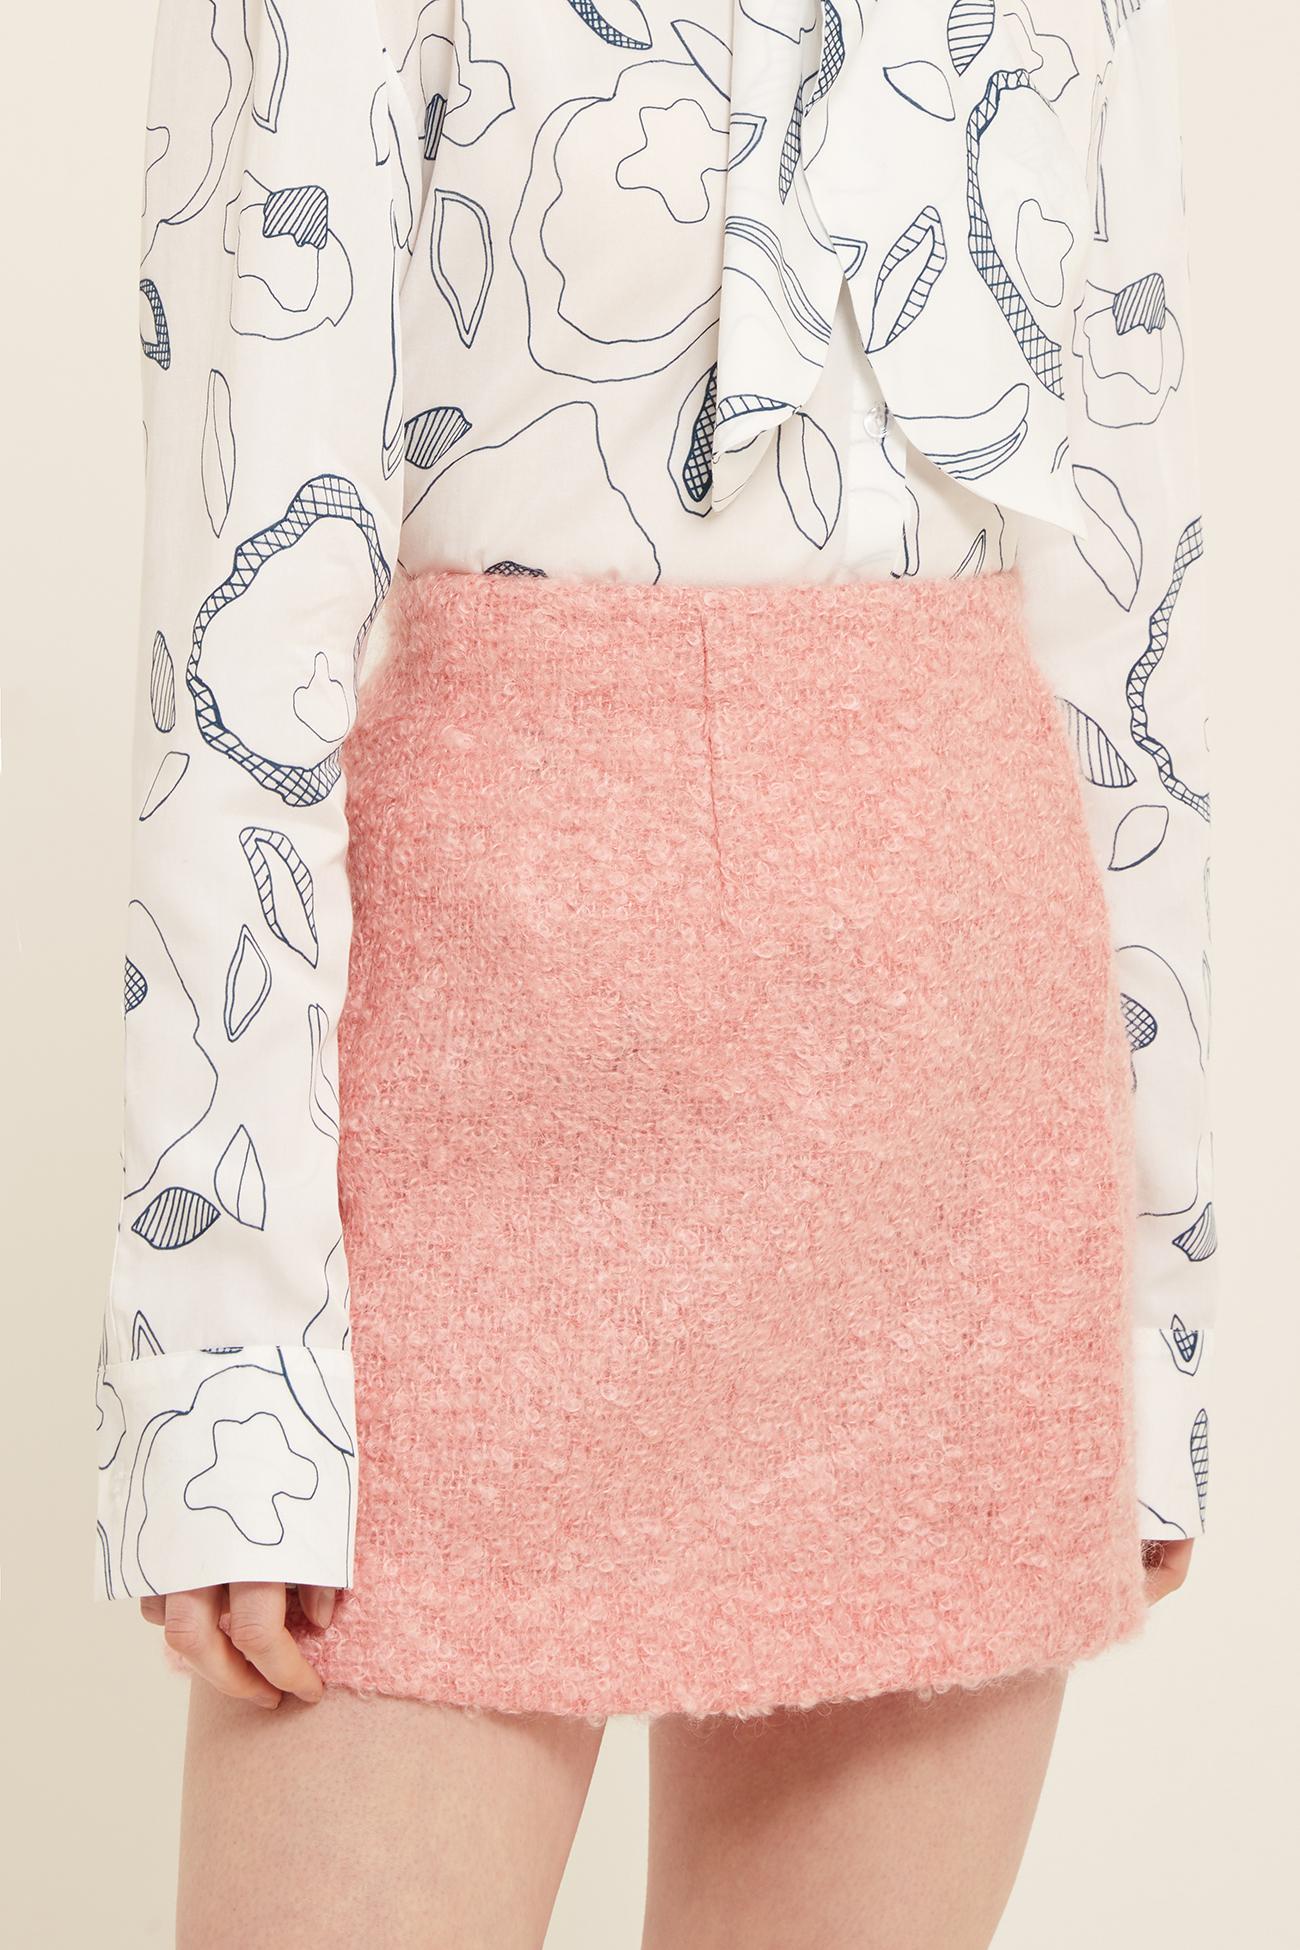 Aline Xnxx aline mini skirt